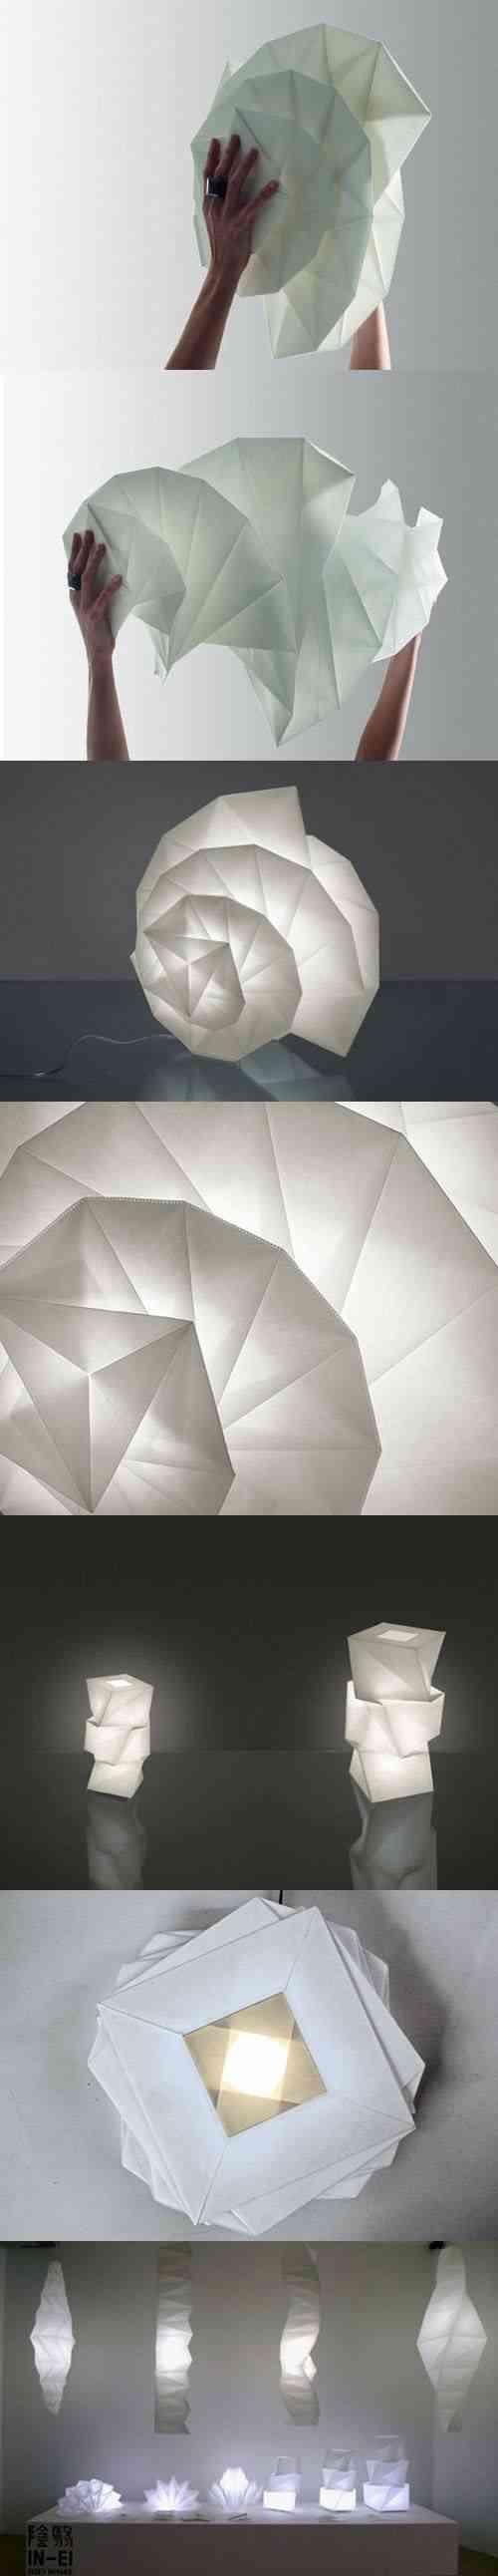 lamparas de papel - 3